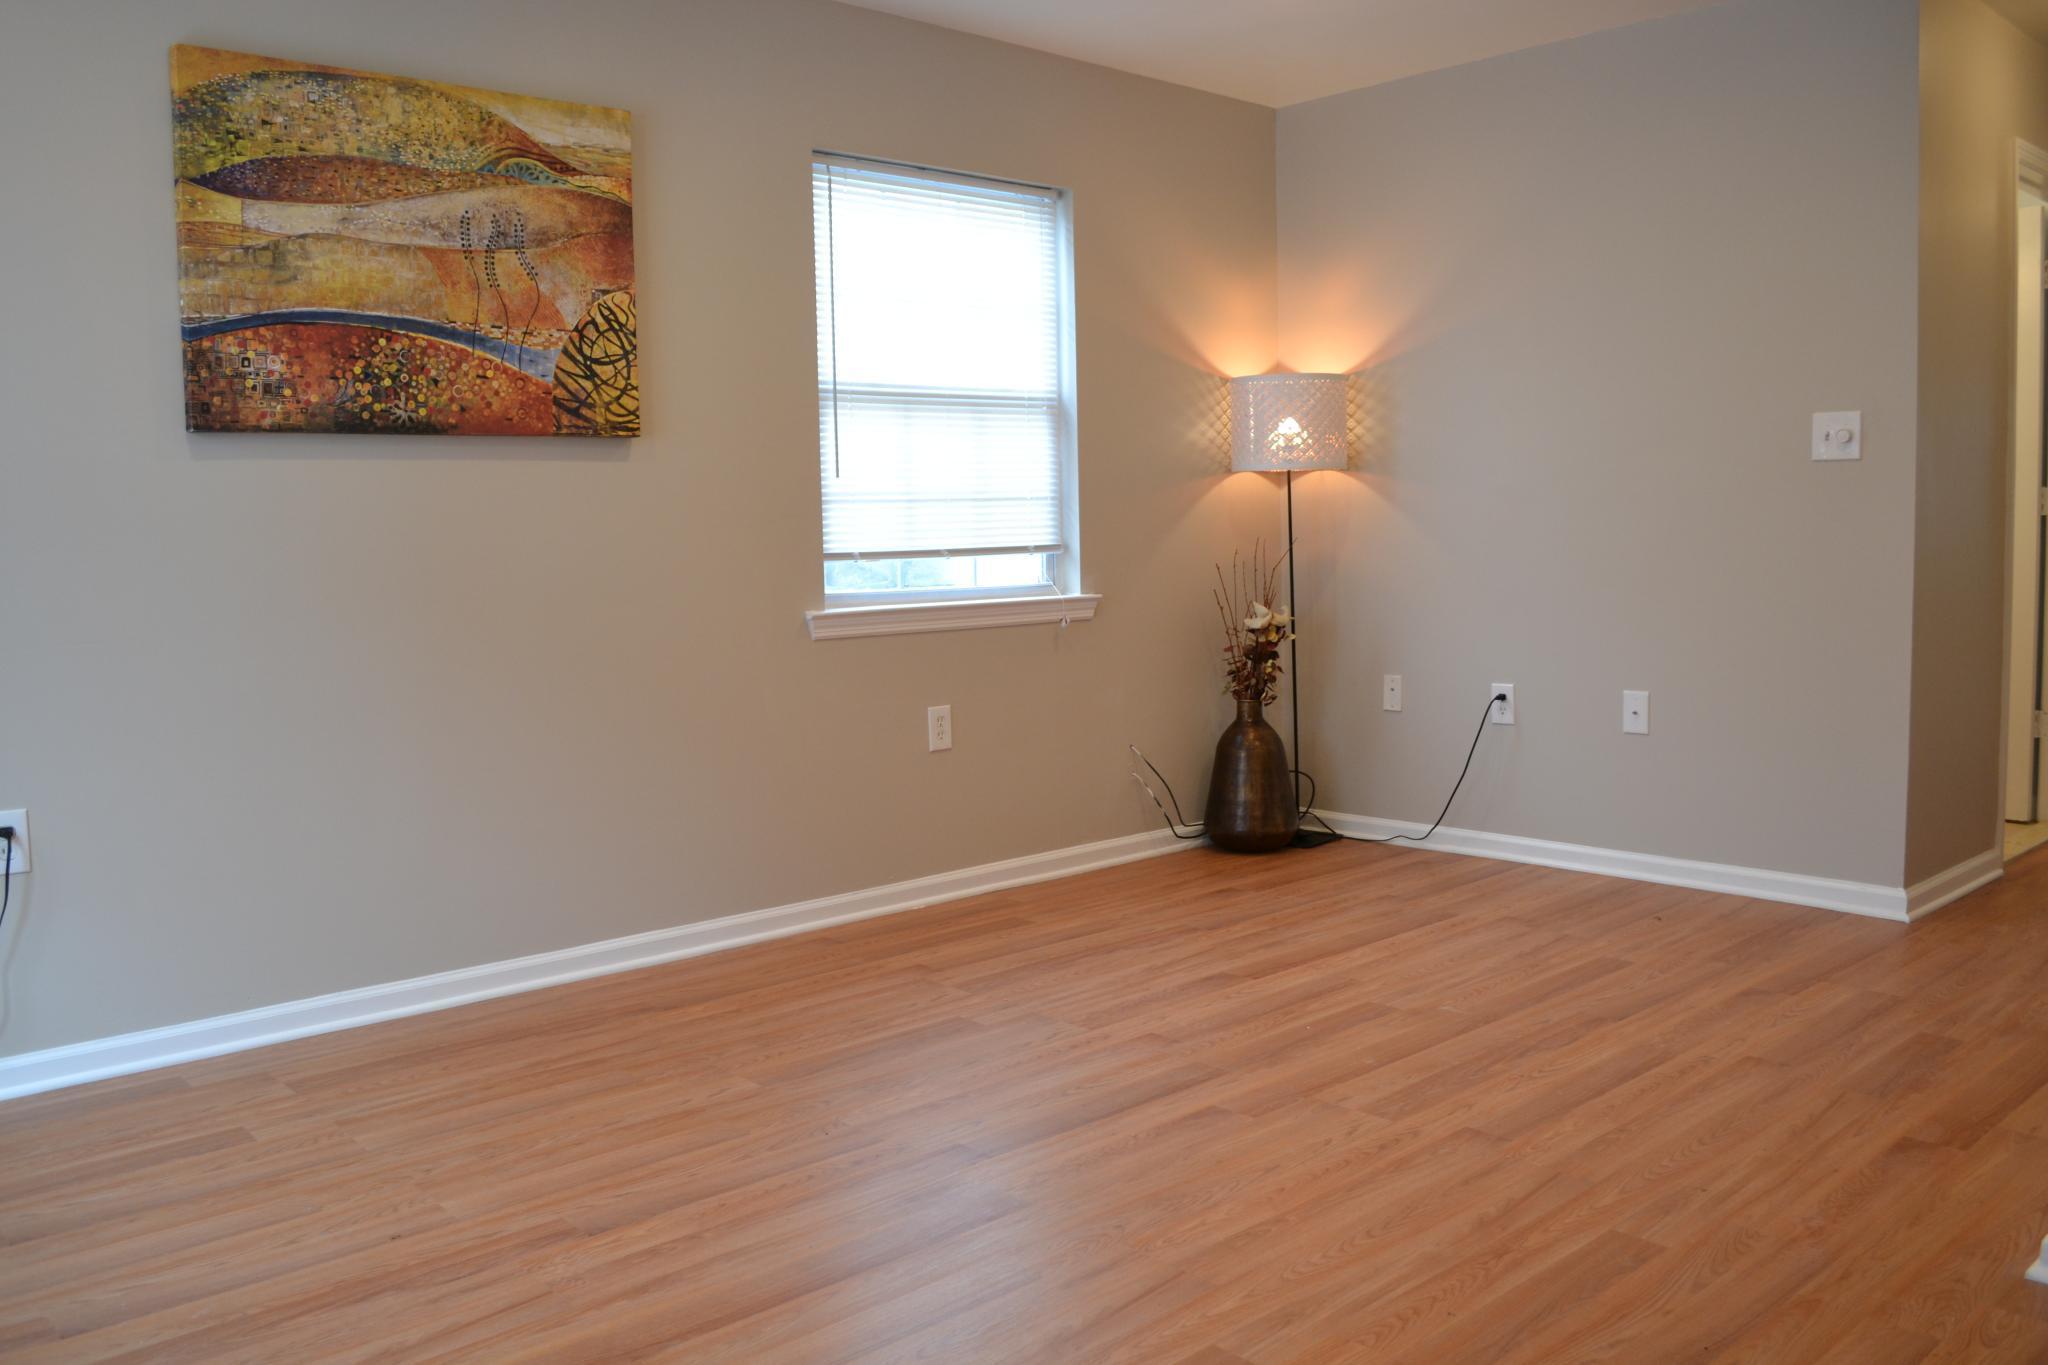 13 17th Ave, Newark, NJ 07103 For Rent | Trulia